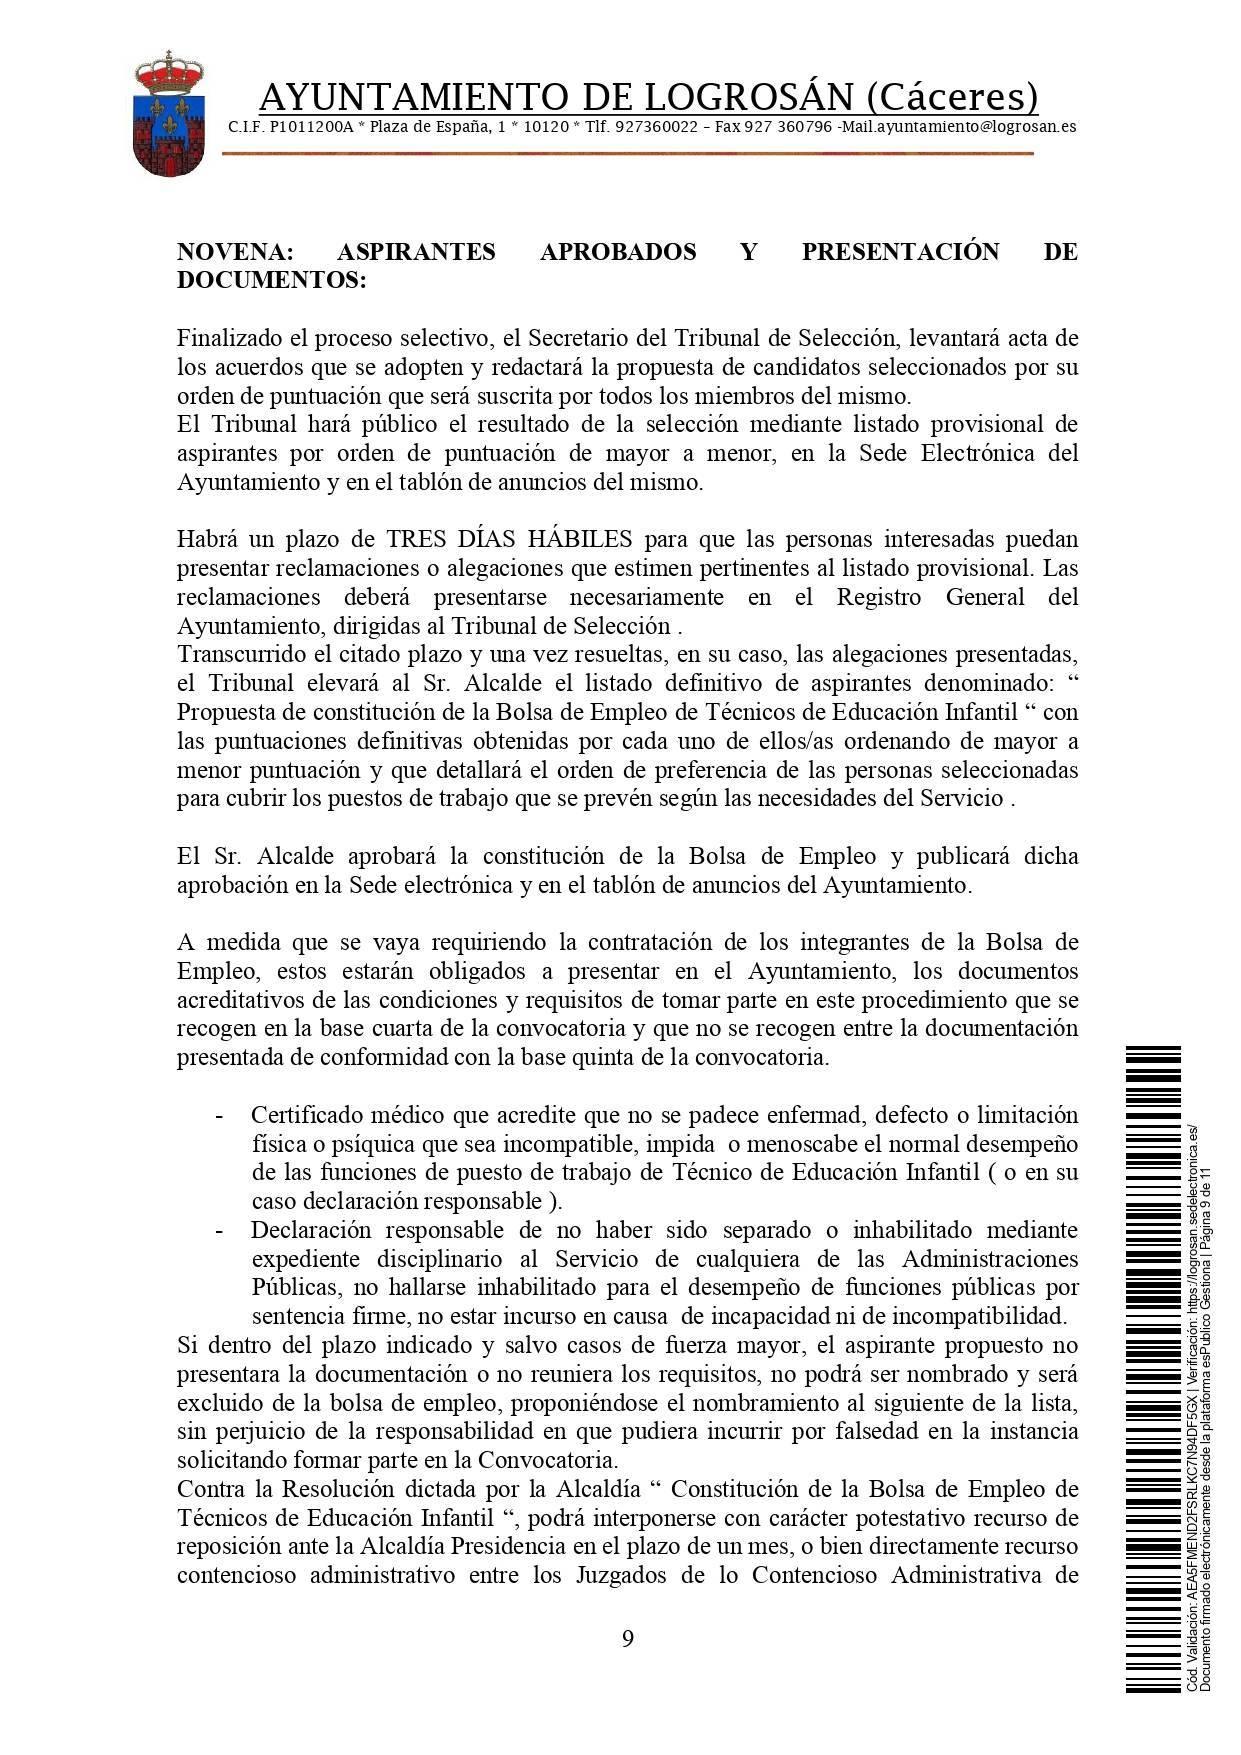 Bolsa de técnicos-as en educación infantil (2021) - Logrosán (Cáceres) 9